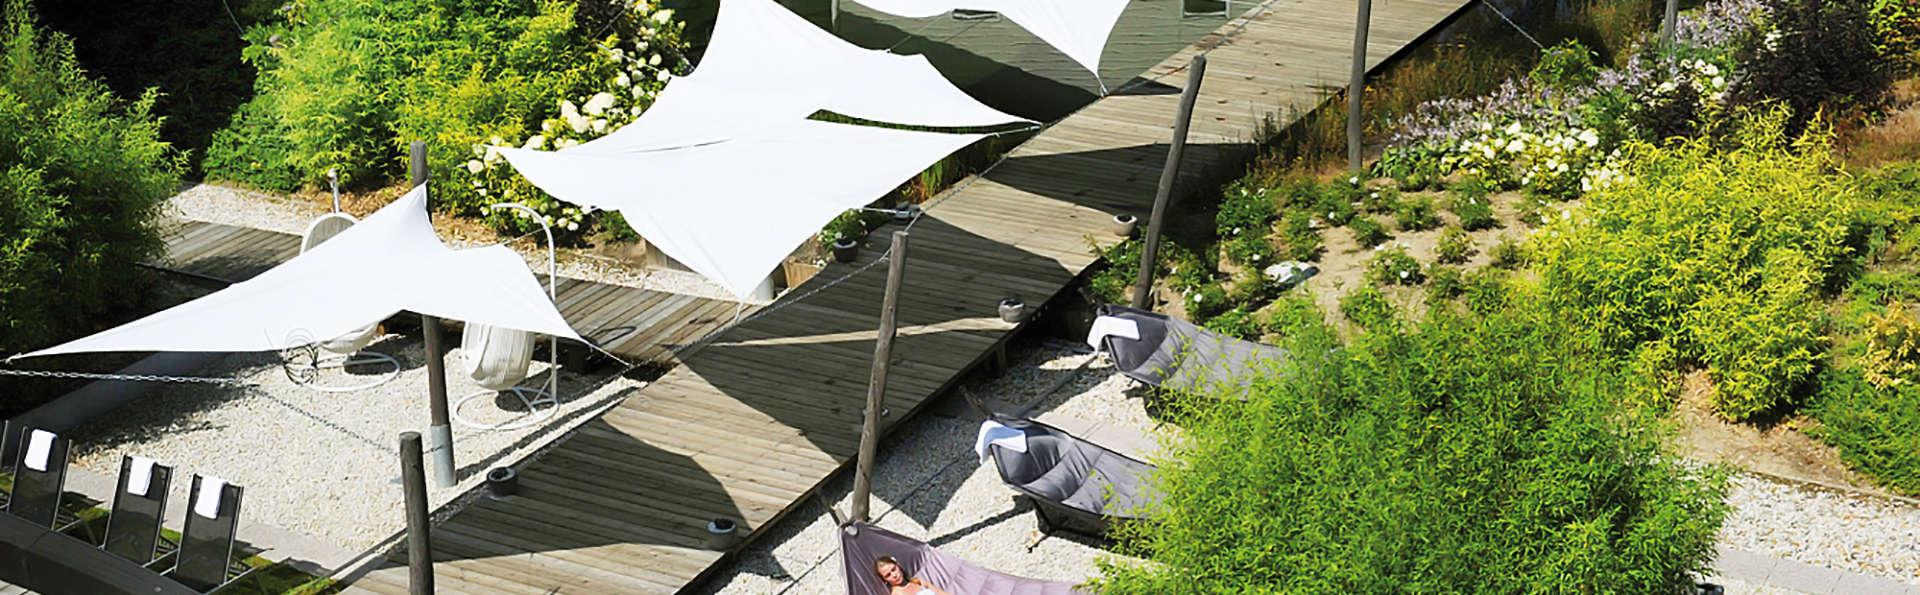 Amadore Hotel Restaurant De Kamperduinen - EDIT_garden_relax.jpg